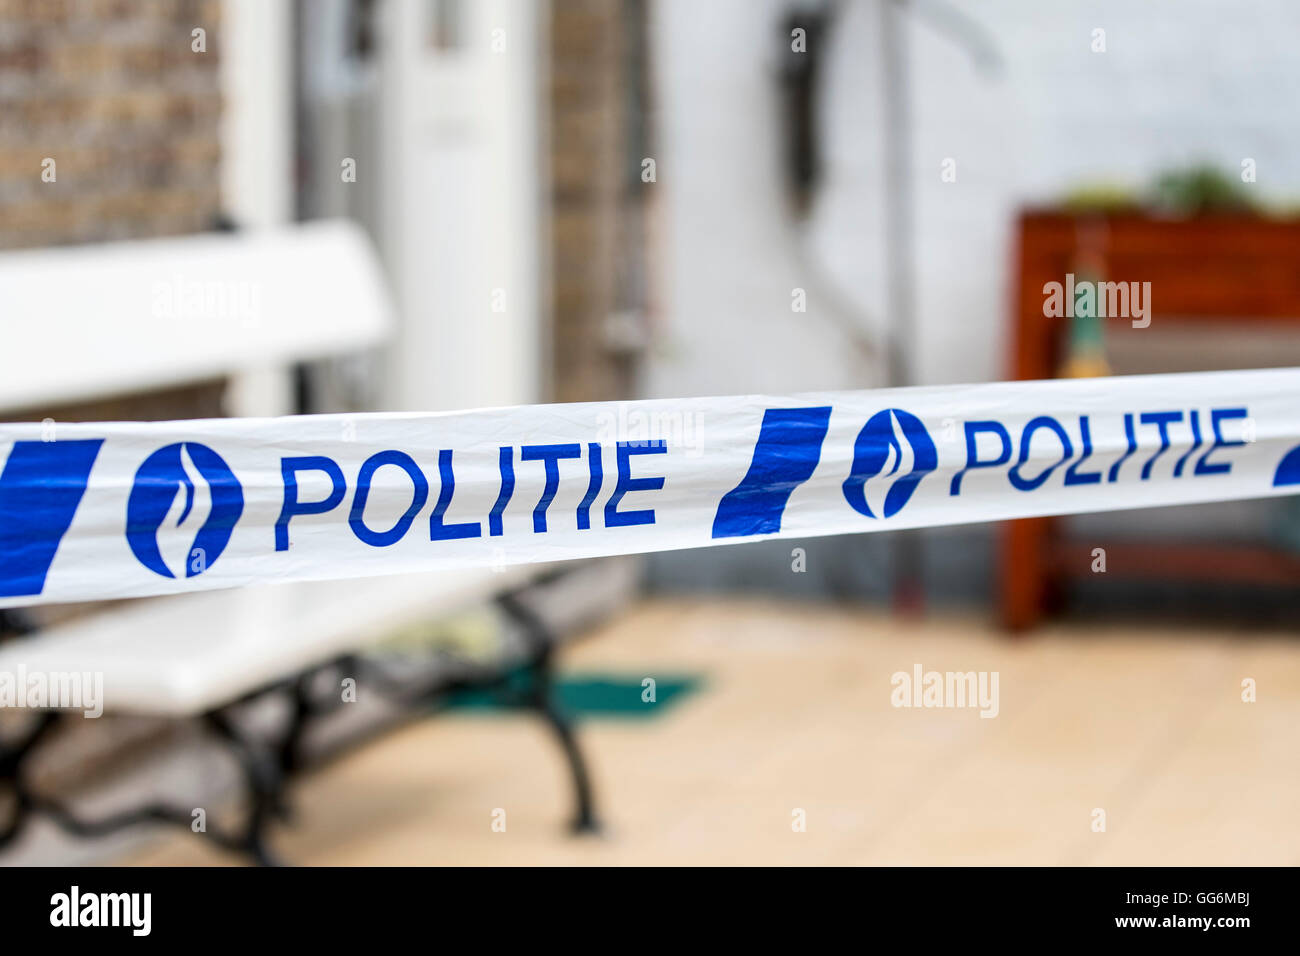 La polizia belga / politie nastro in corrispondenza della scena del crimine, Belgio Immagini Stock